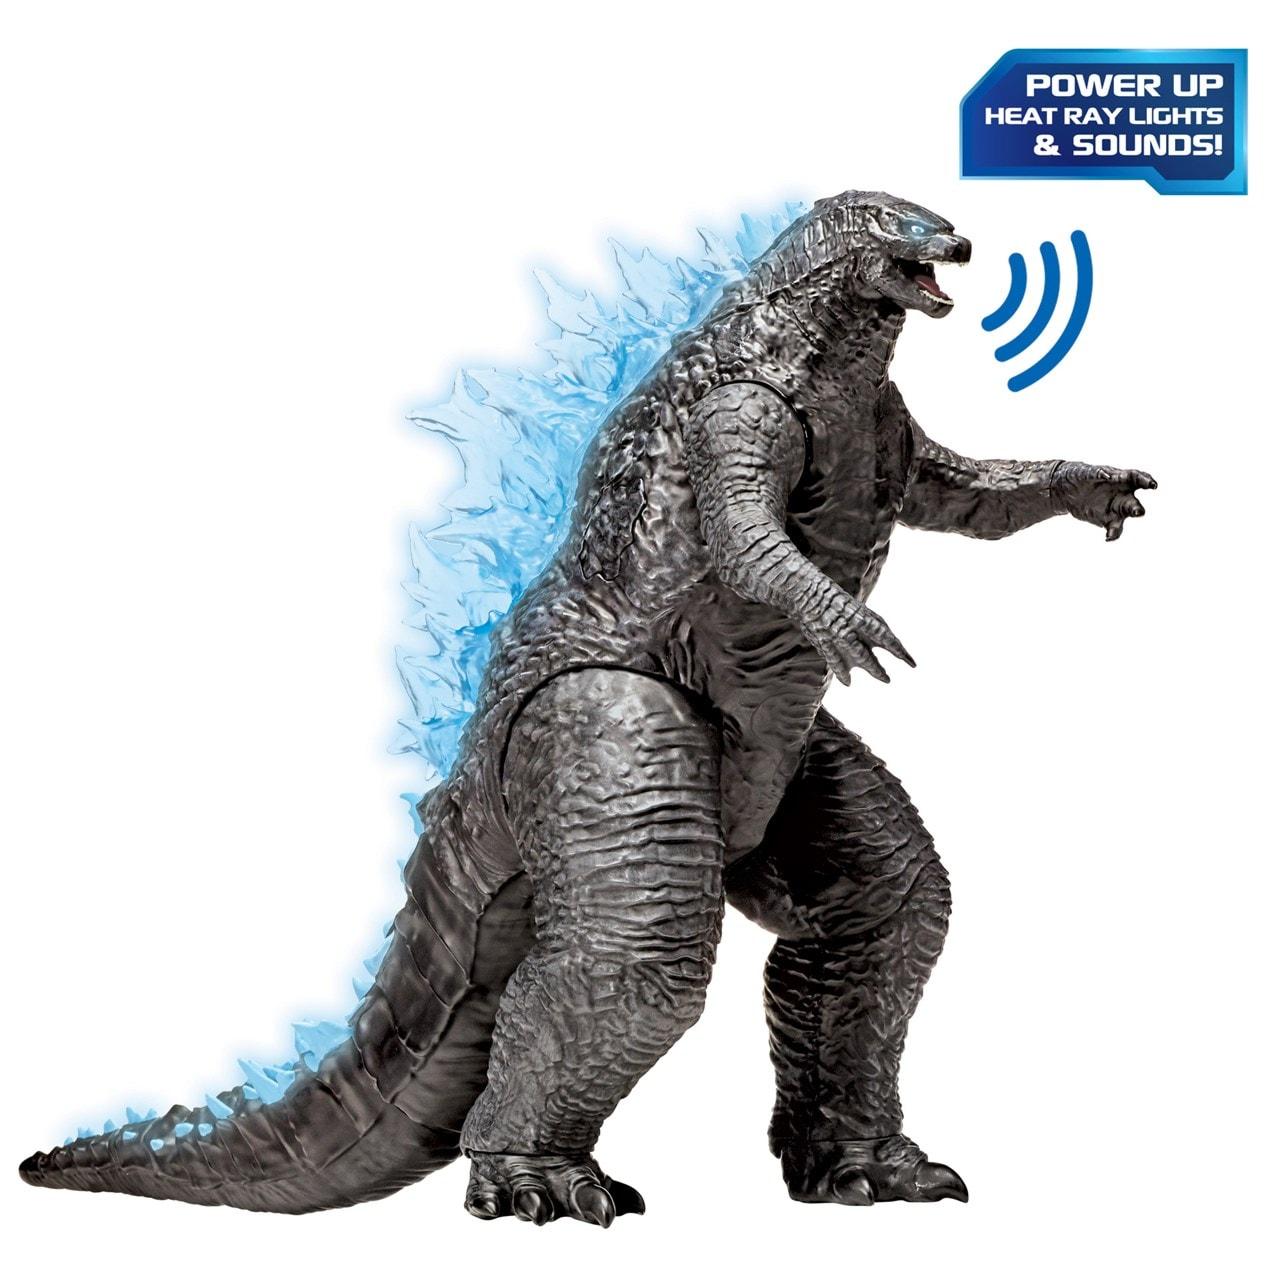 Monsterverse Godzilla vs Kong: Mega Godzilla with Lights & Sounds Action Figure - 1